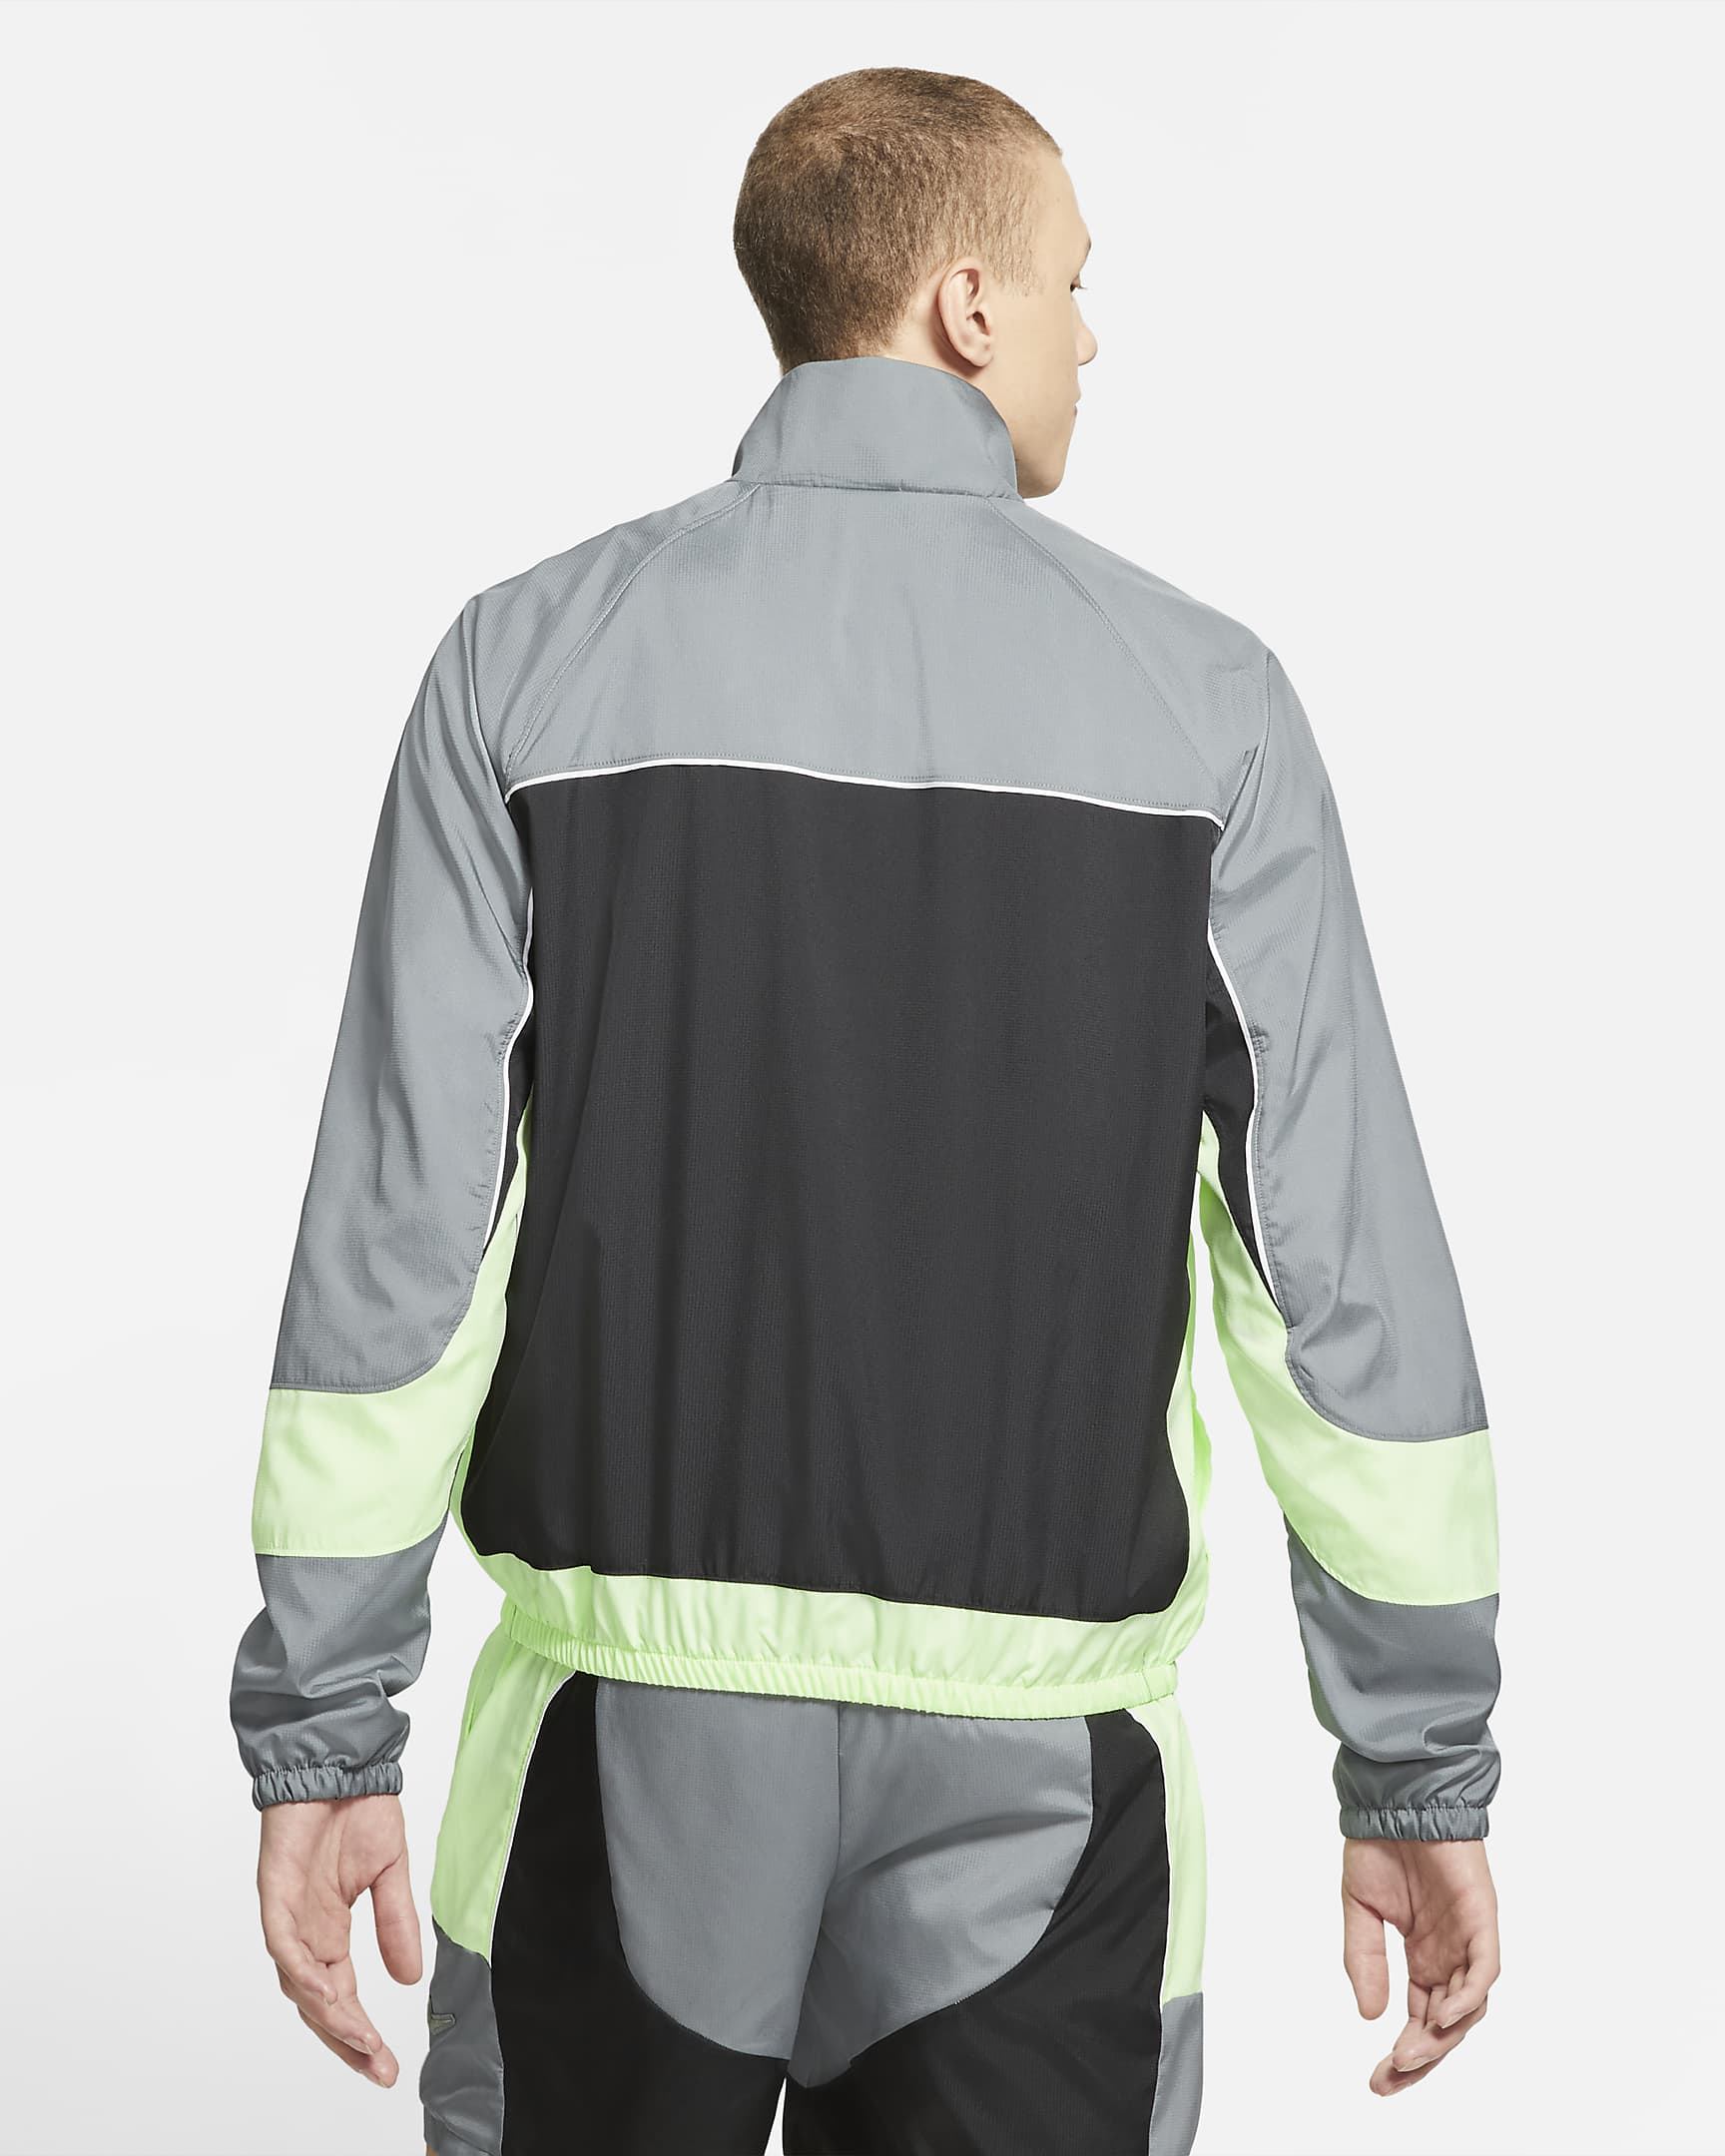 throwback-mens-basketball-jacket-J2VGbm-1